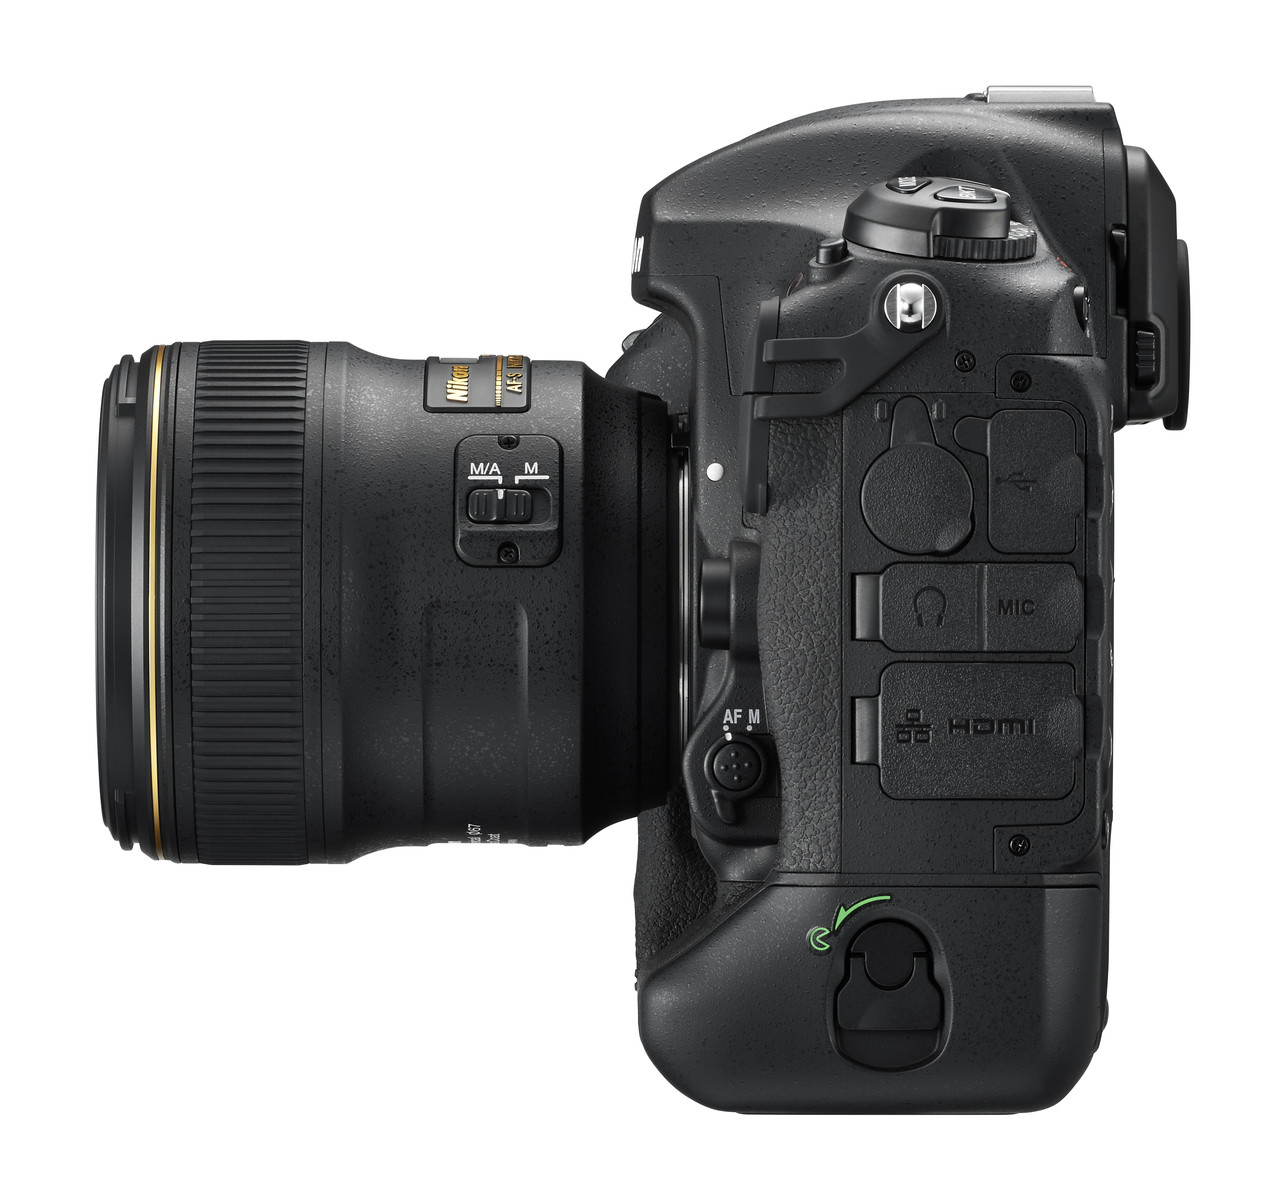 Nikon D5 Left Side